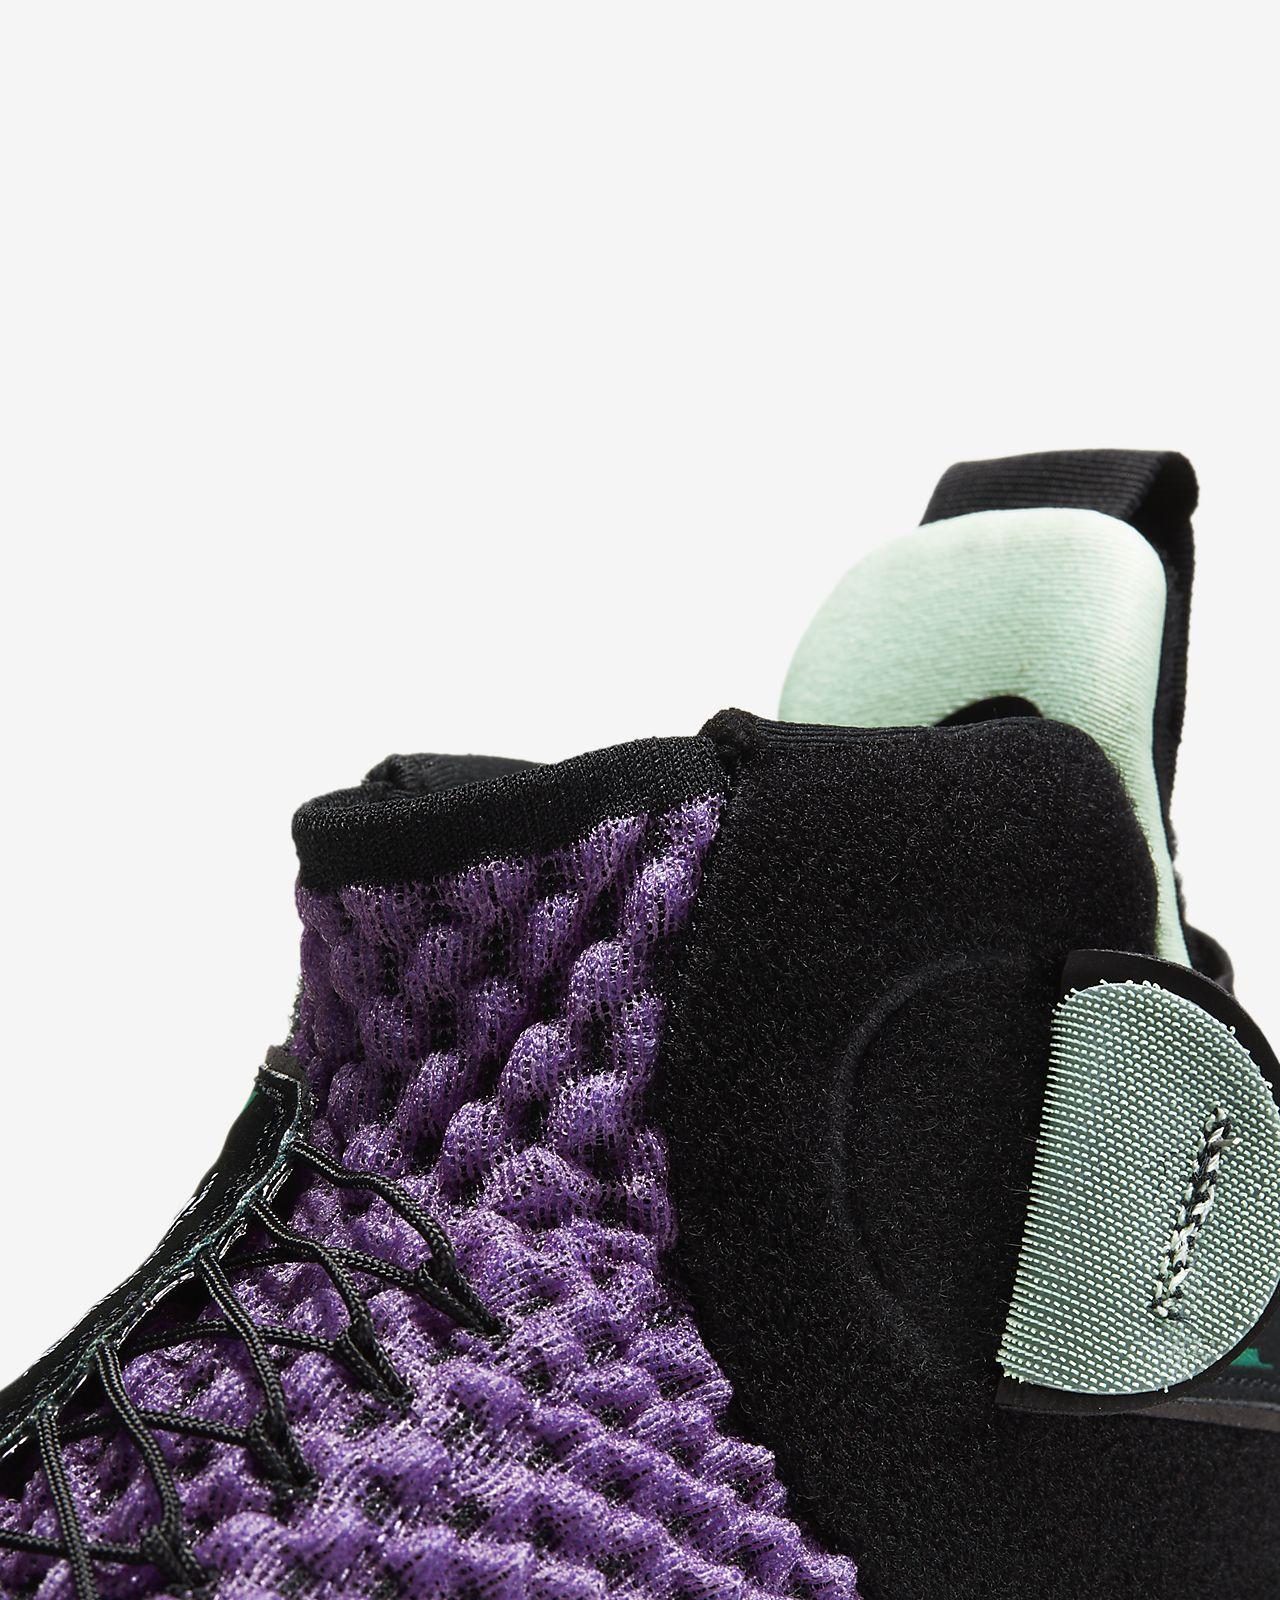 Nike Air Zoom UNVRS FlyEase Basketball Shoe (Vivid Purple